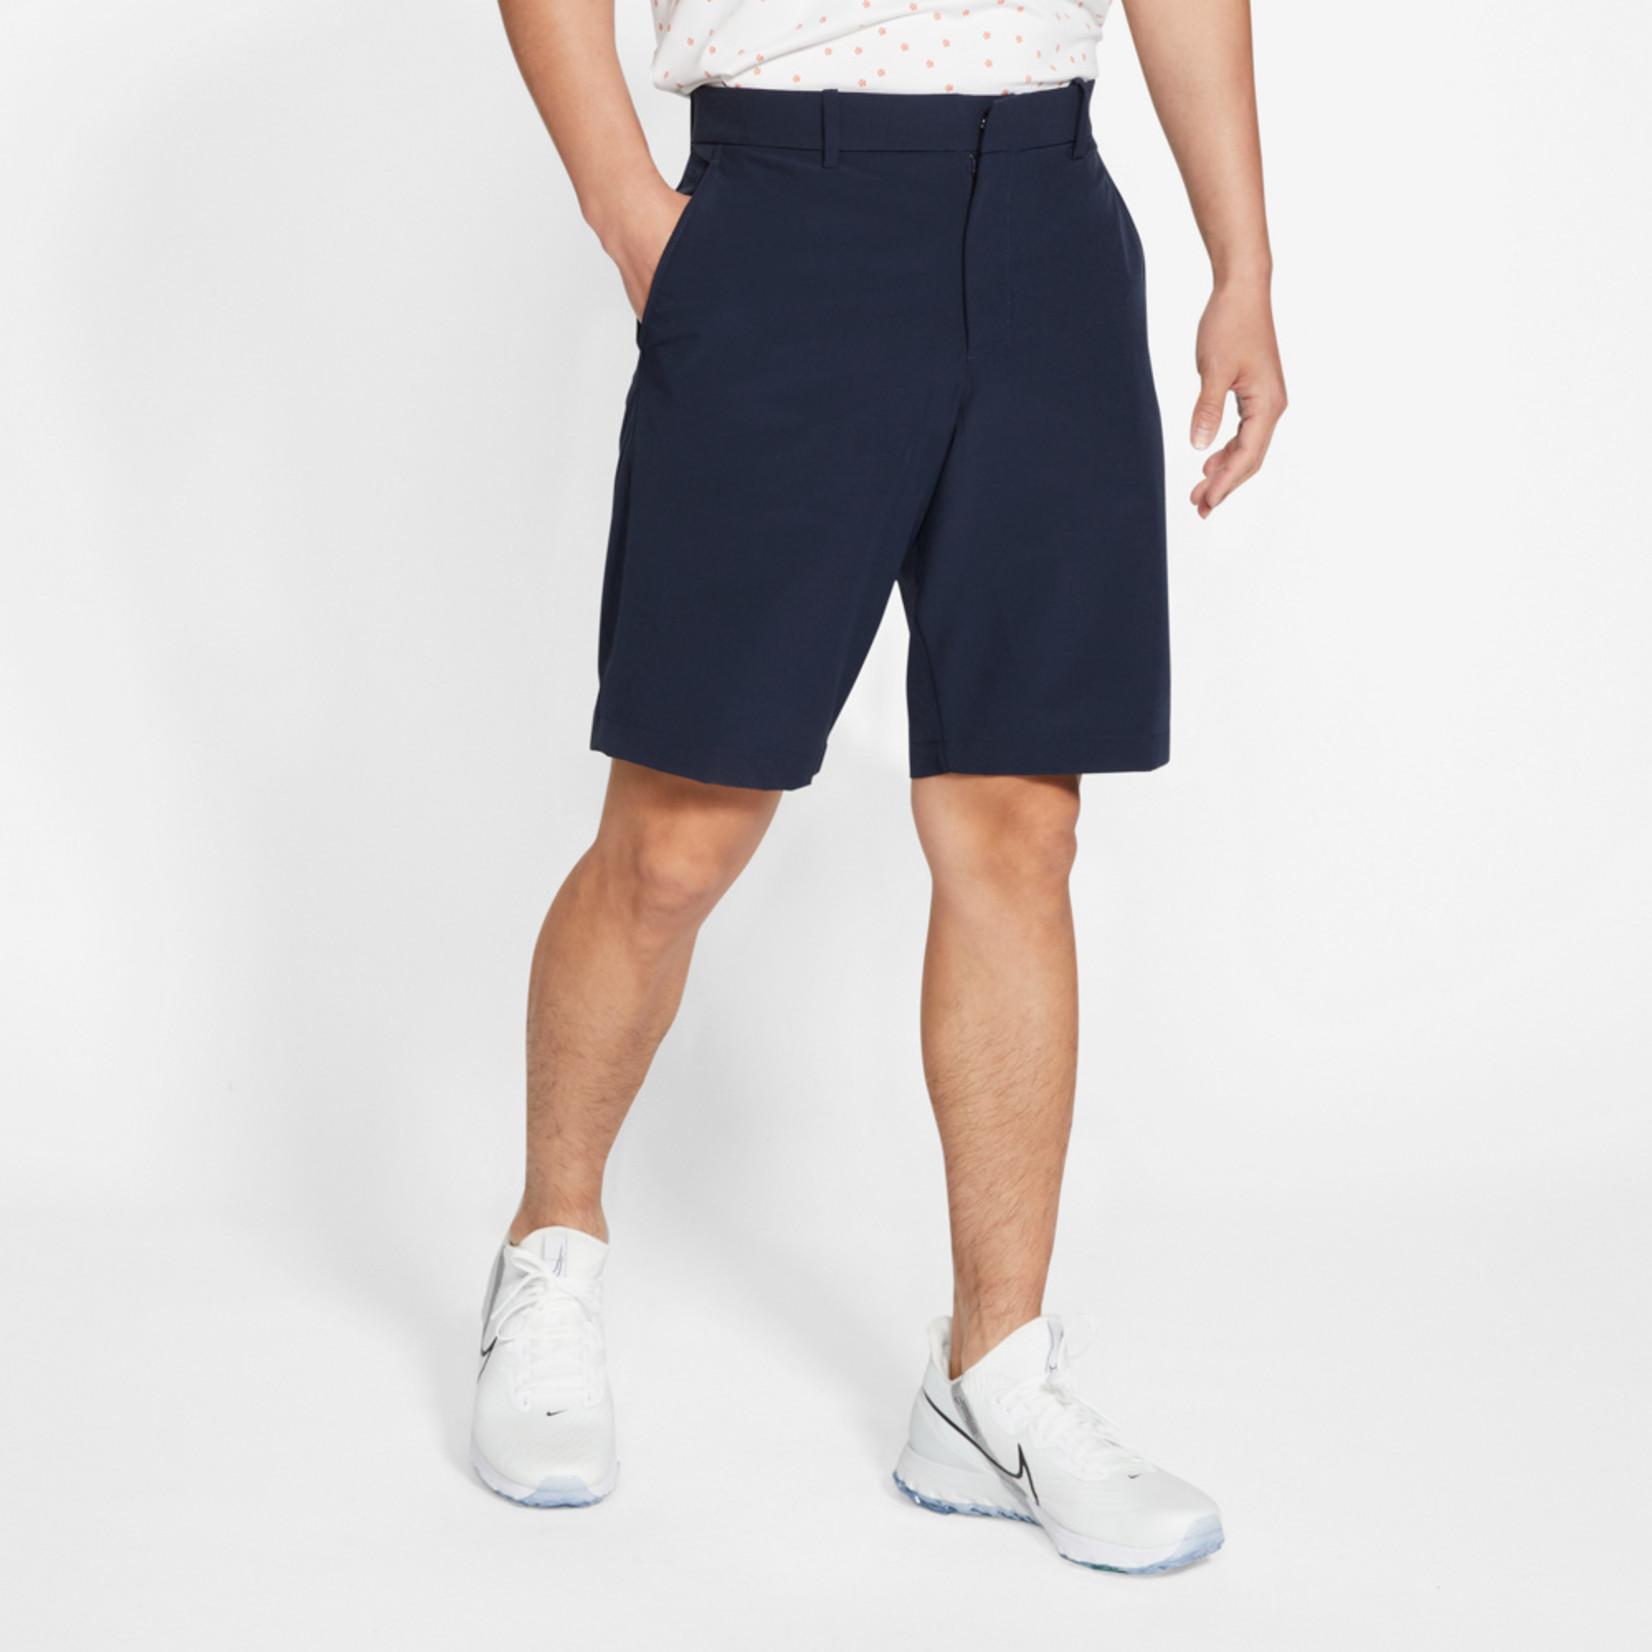 Nike Nike Dri-FIT Hybrid Shorts (21)